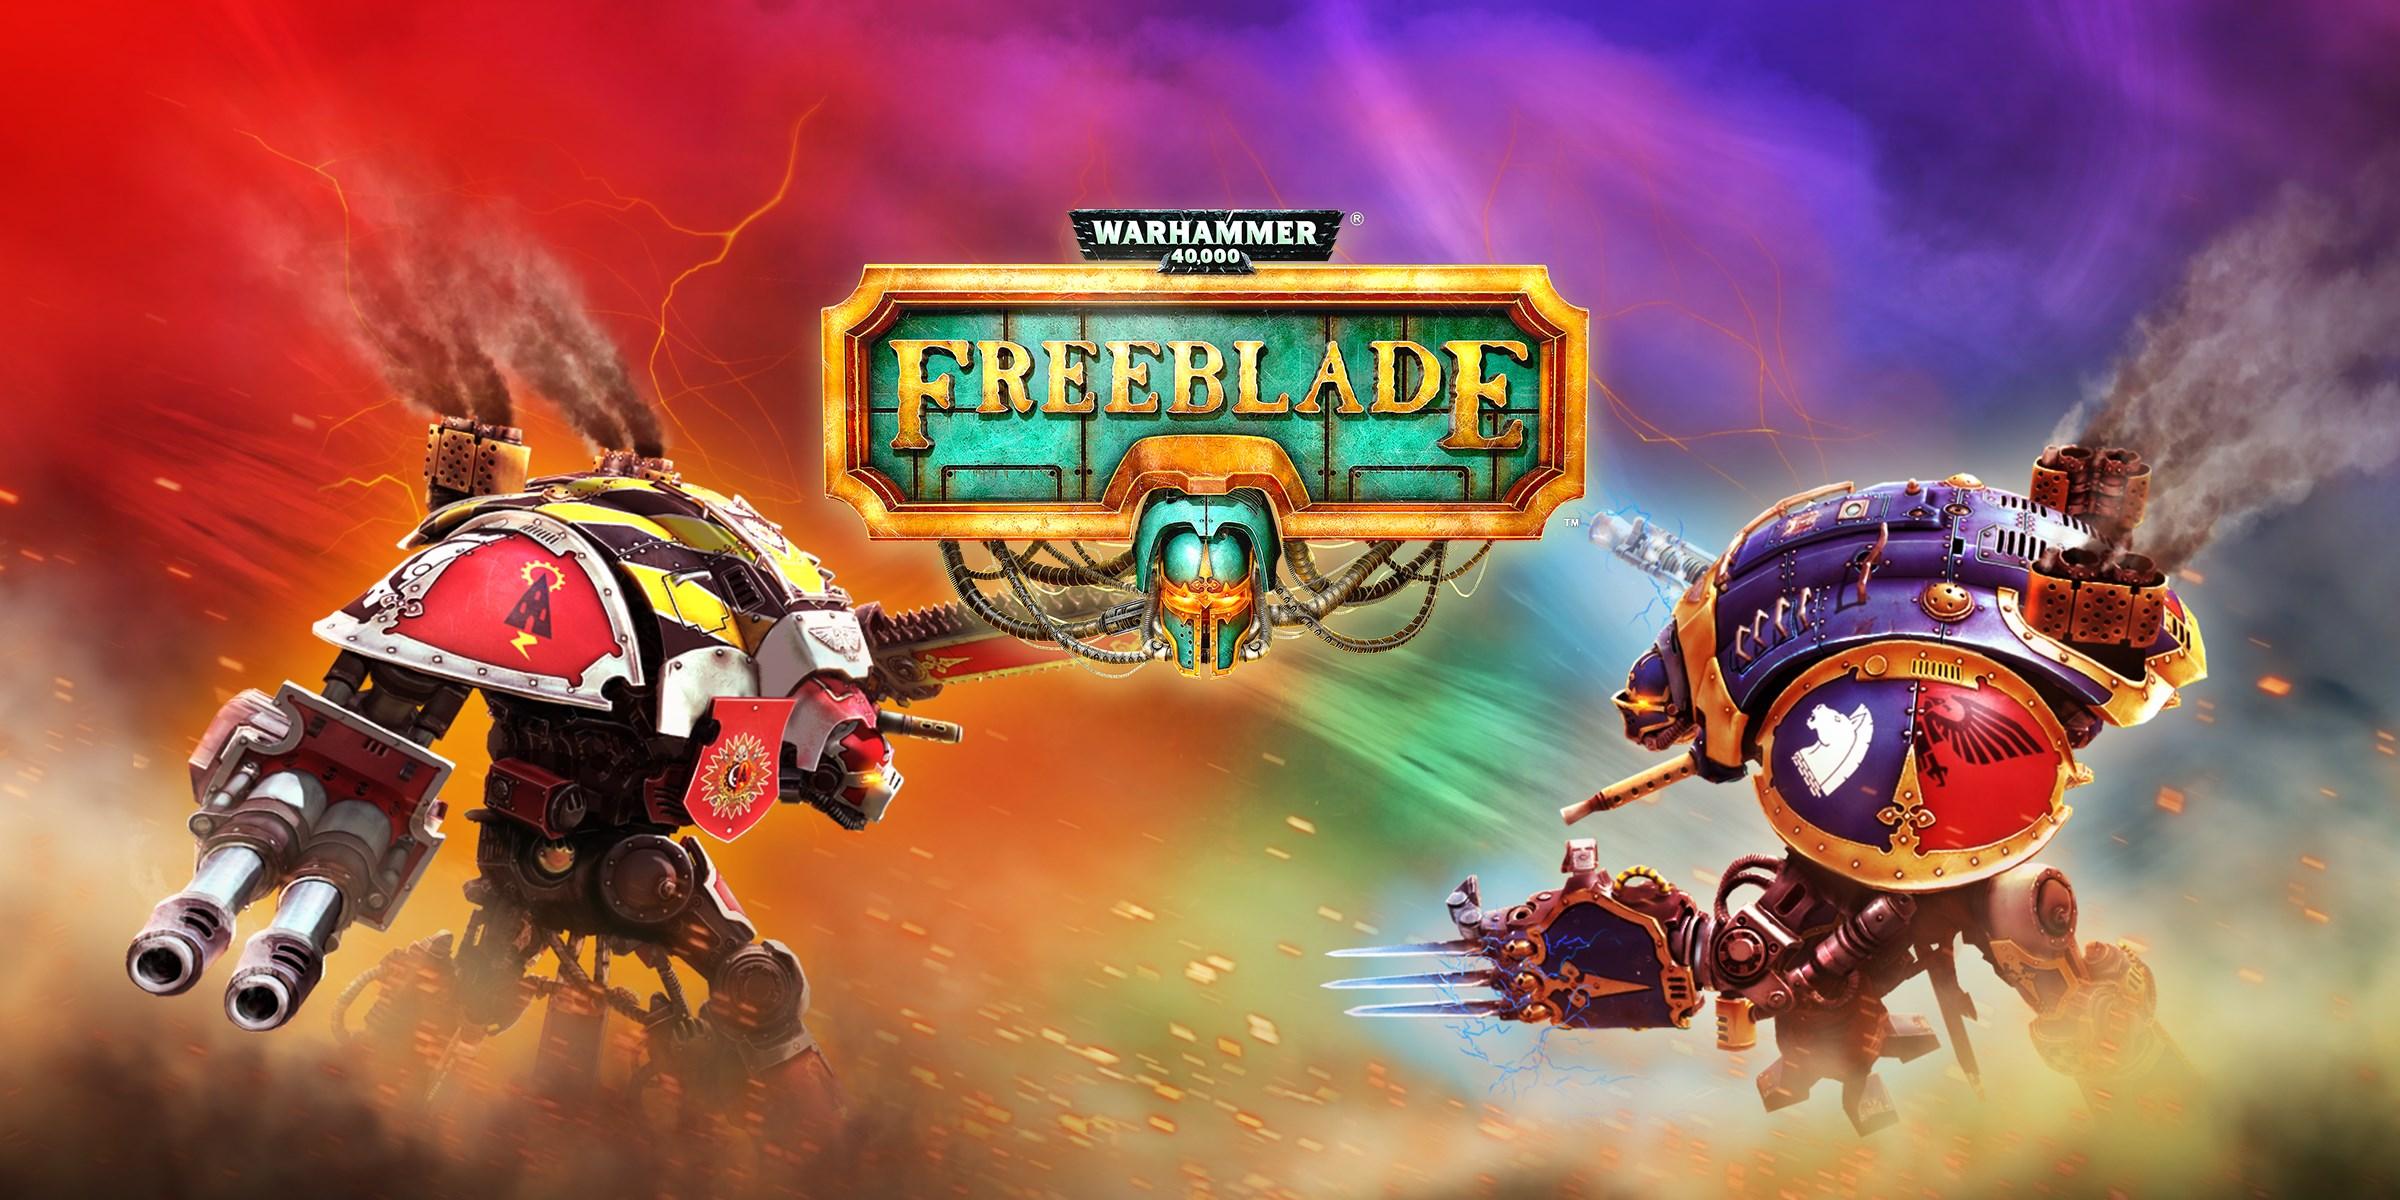 Get Warhammer 40,000: Freeblade - Microsoft Store